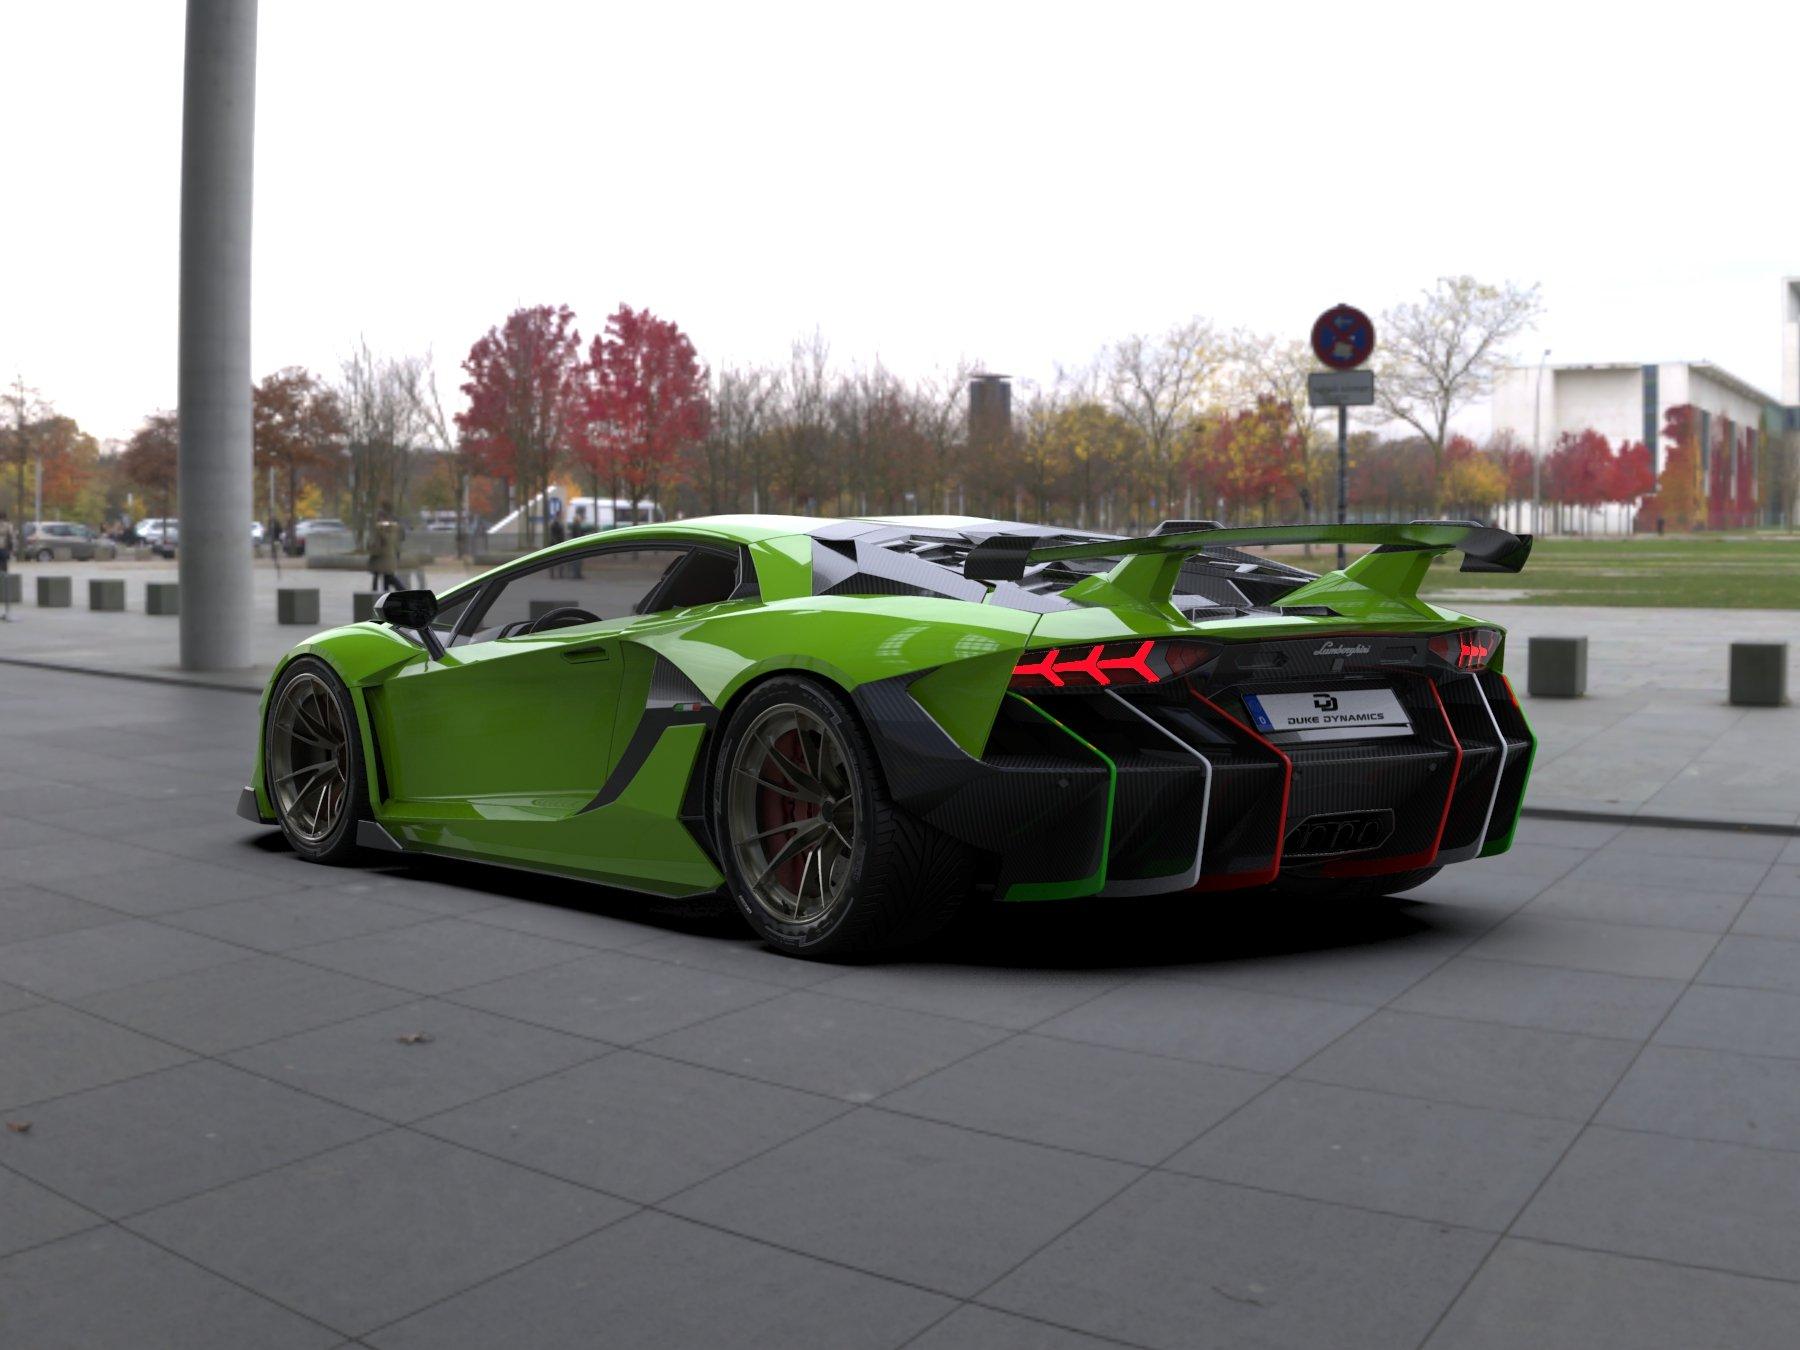 Lamborghini_Aventador_by_Duke_Dynamics_0024